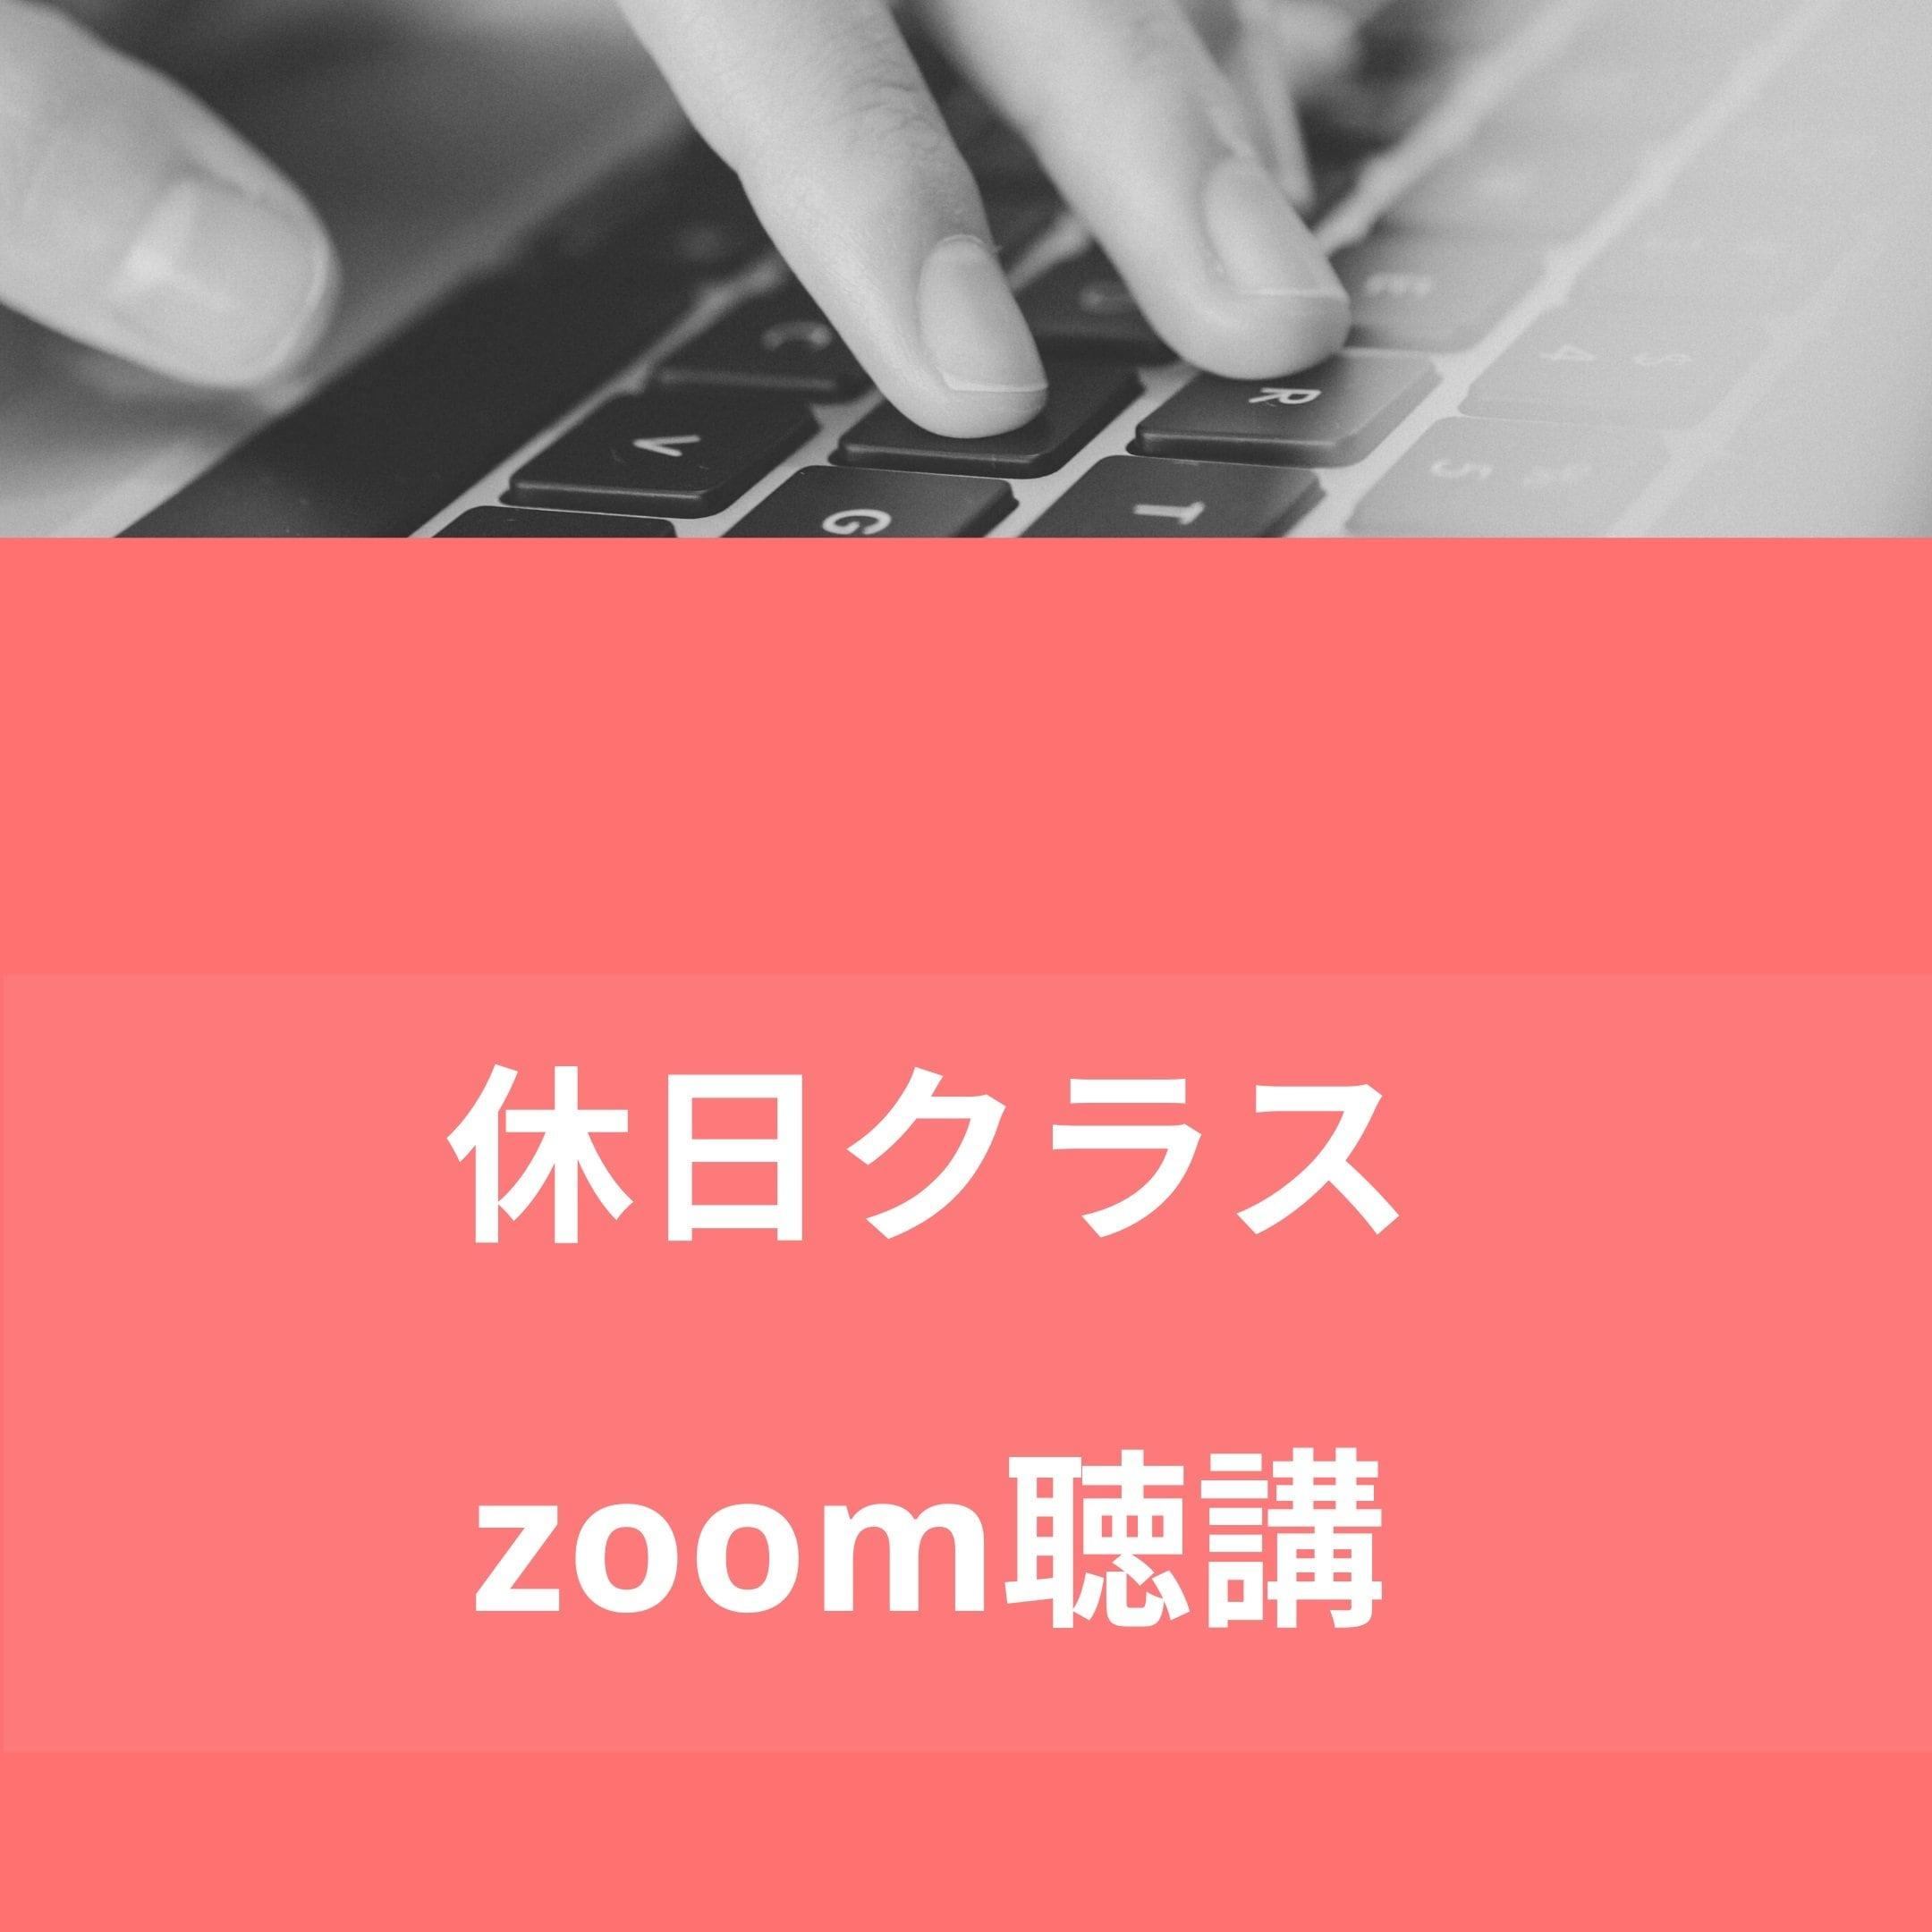 ★zoom聴講チケット★2月11日(祝)休日クラスのイメージその1